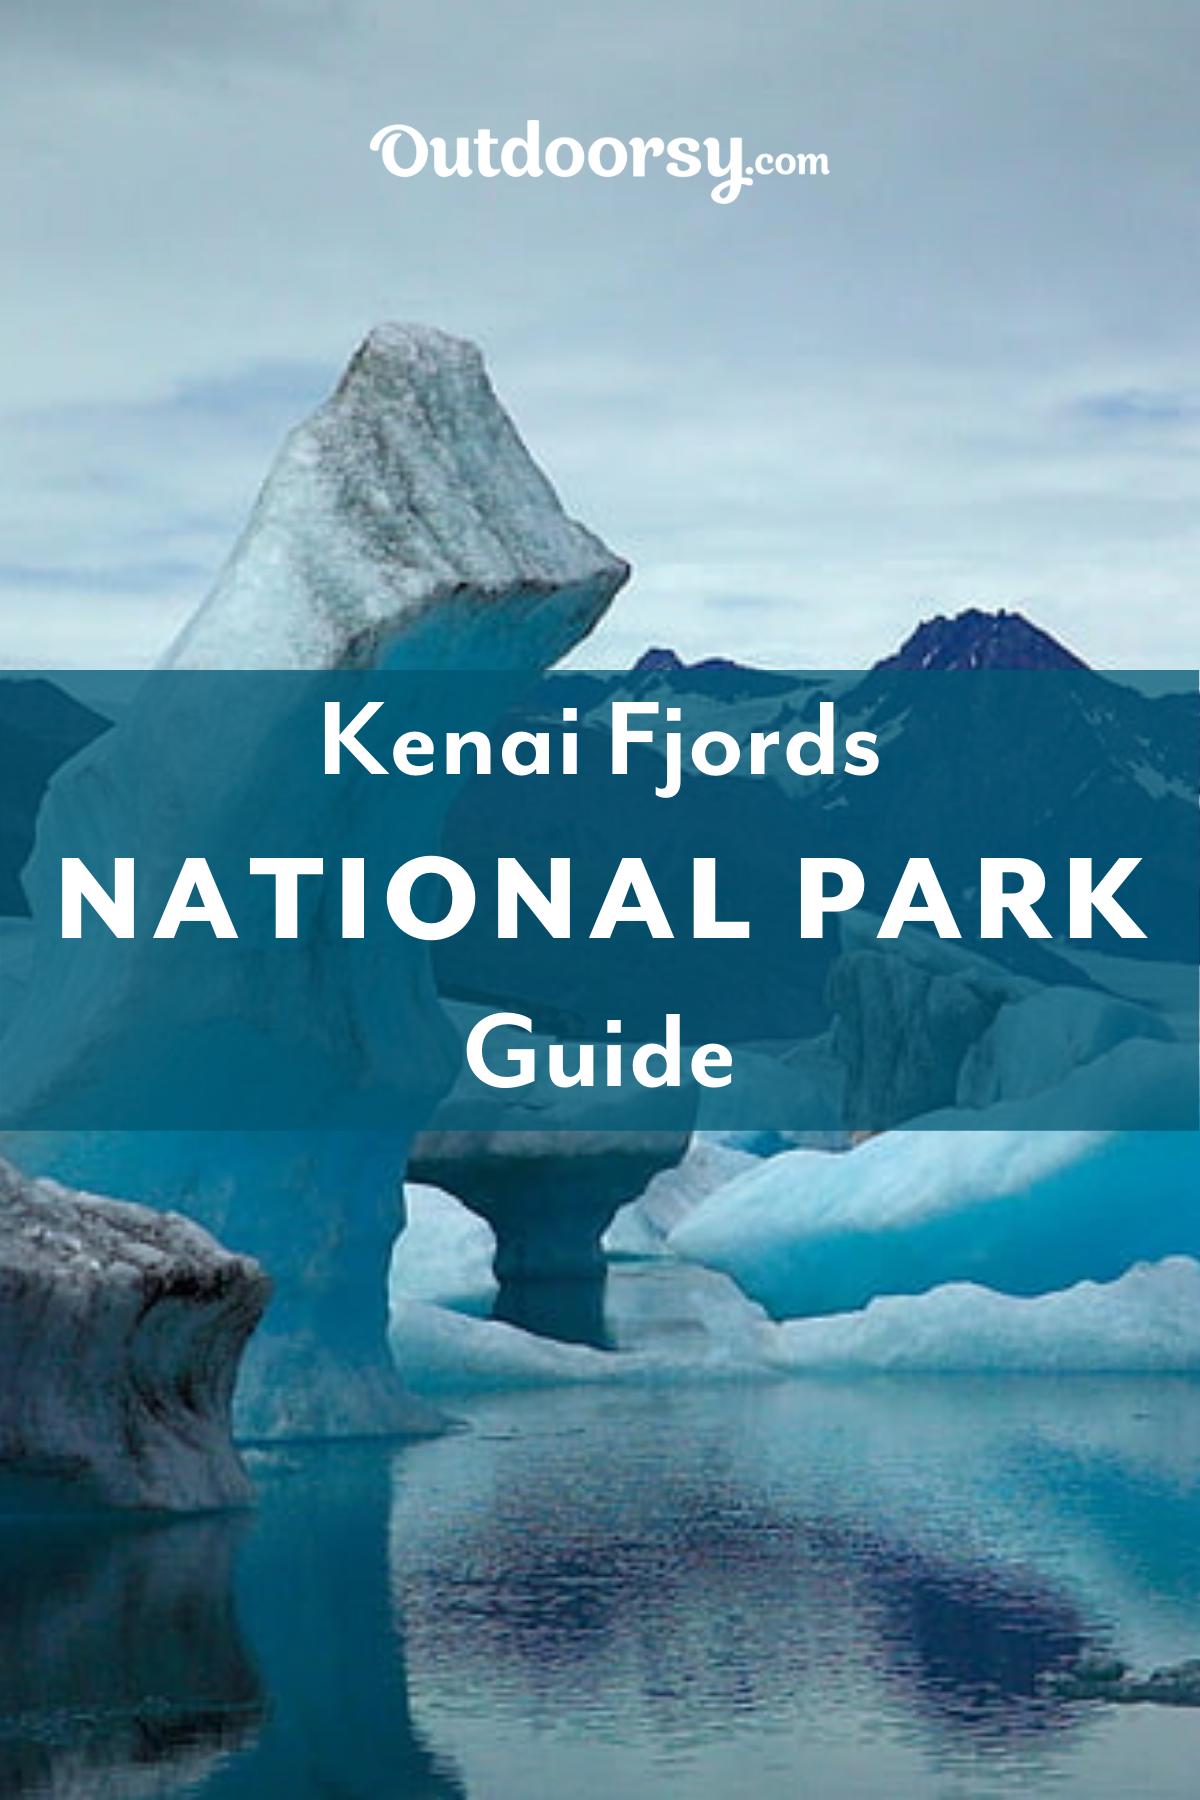 Kenai Fjords National Park Outdoorsy In 2020 Kenai Fjords National Park Kenai Fjords Kenai